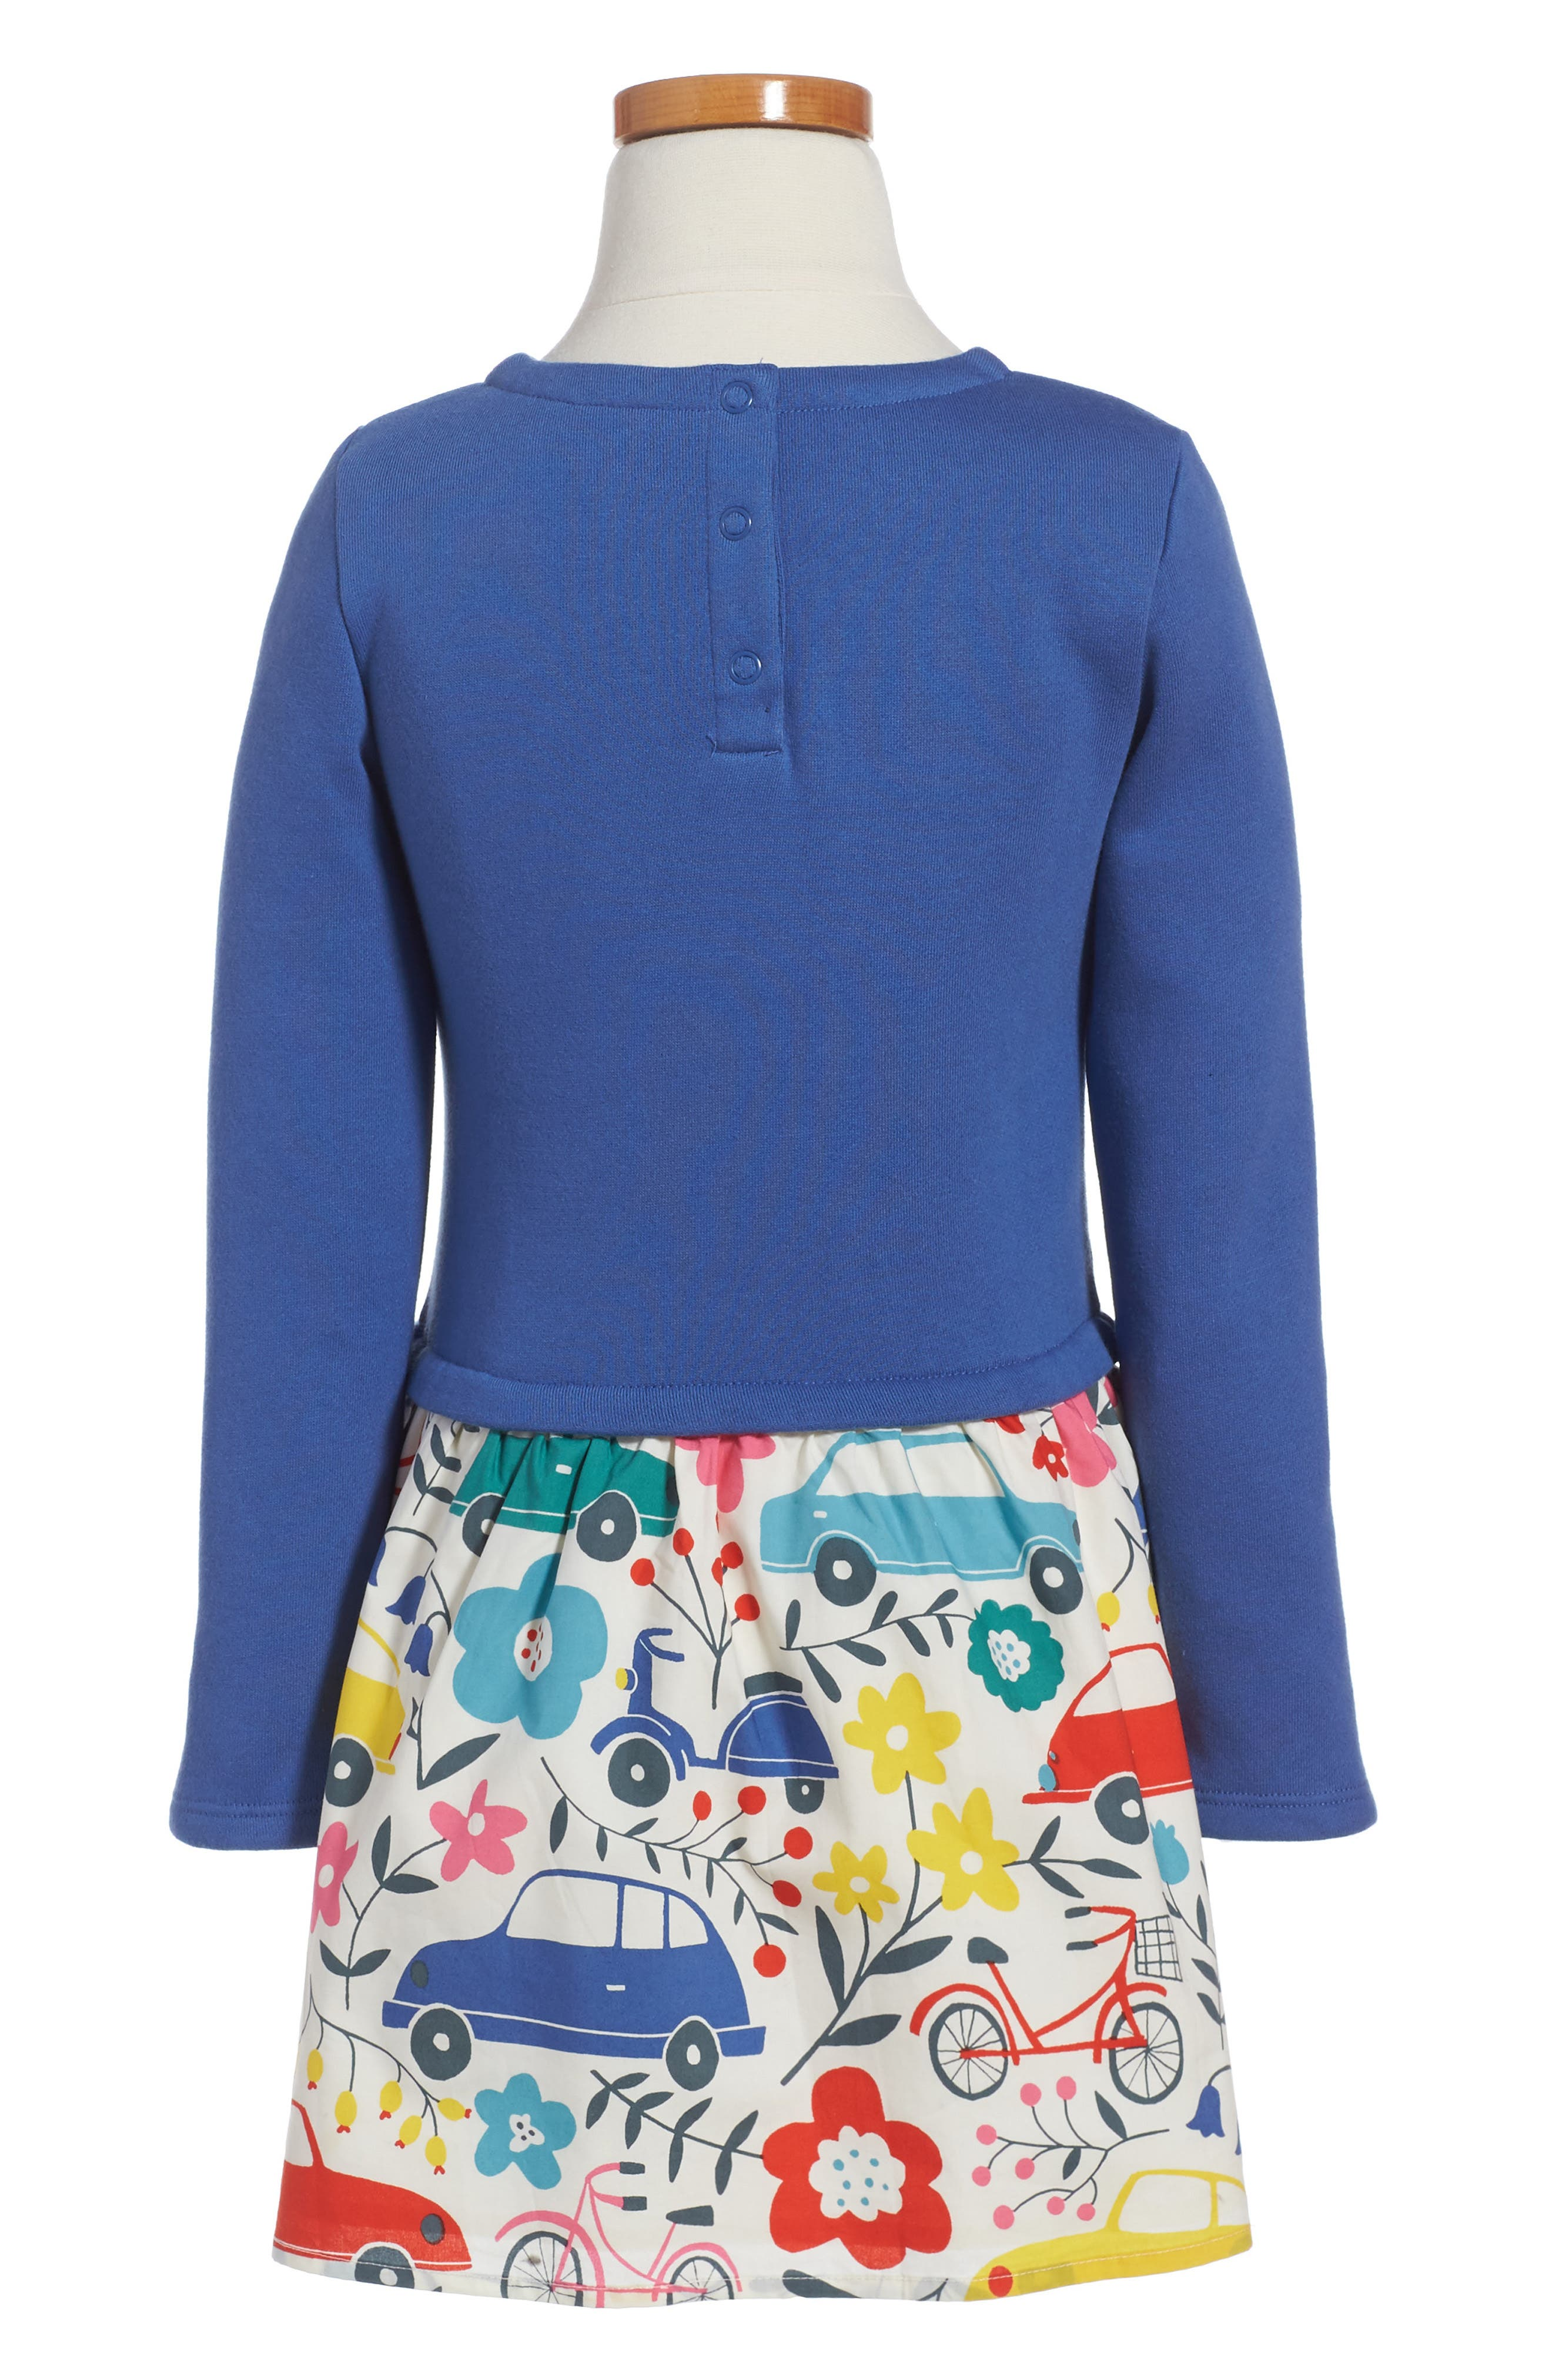 Sequin Appliqué Dress,                             Alternate thumbnail 2, color,                             Bluebell